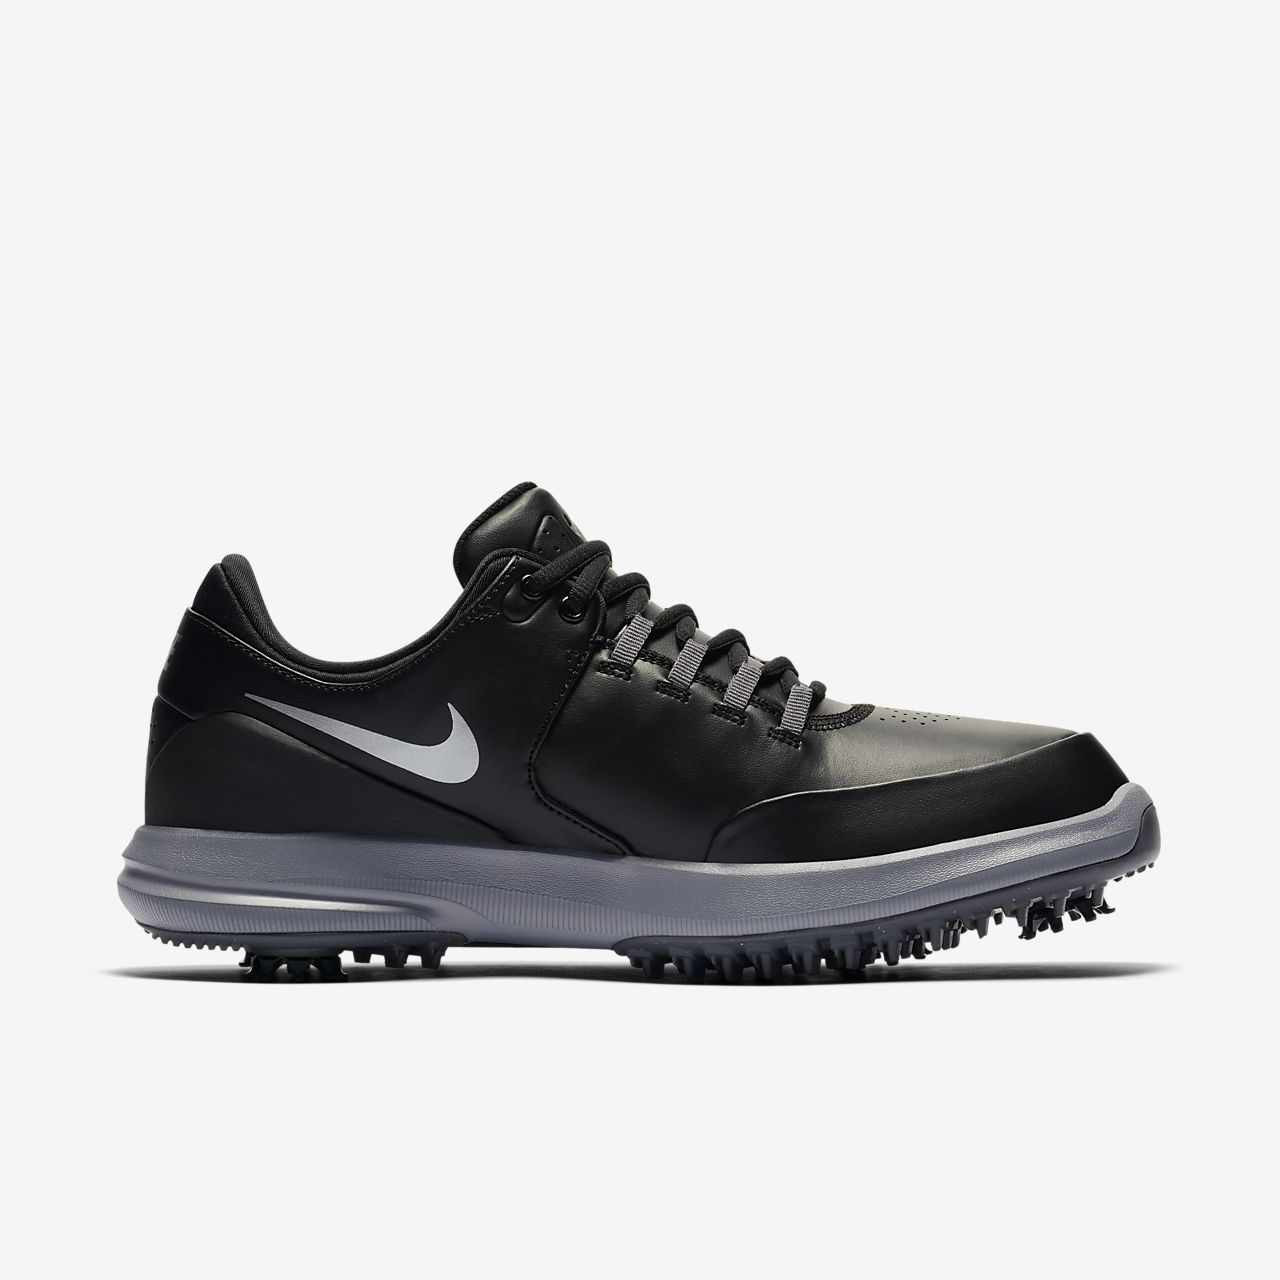 Męskie buty do golfa Nike Air Zoom Accurate